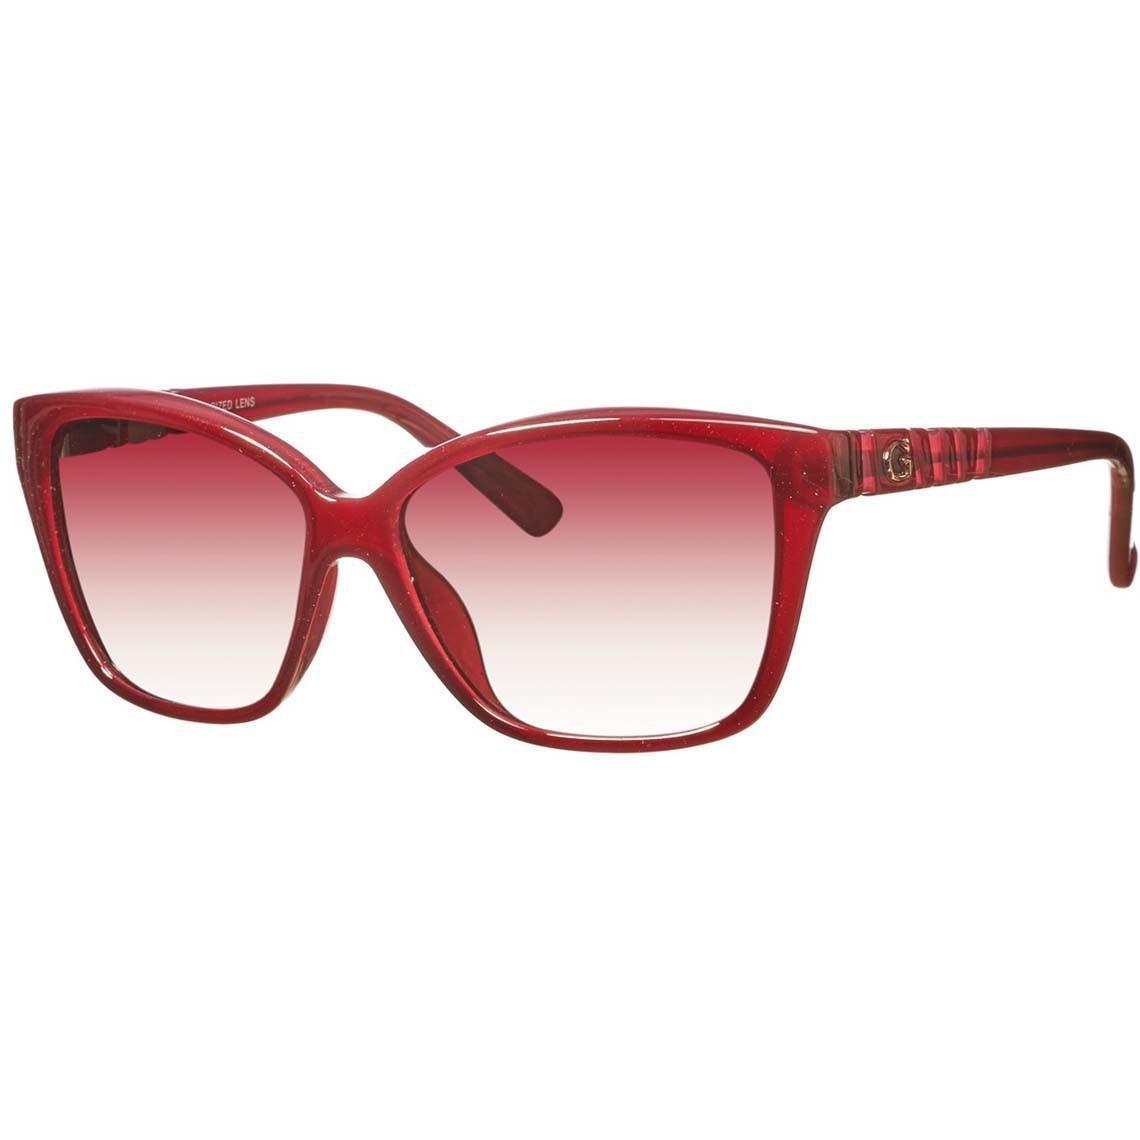 GUESS Women Red Sunglasses GUP2015 BU-52 New w/ Case